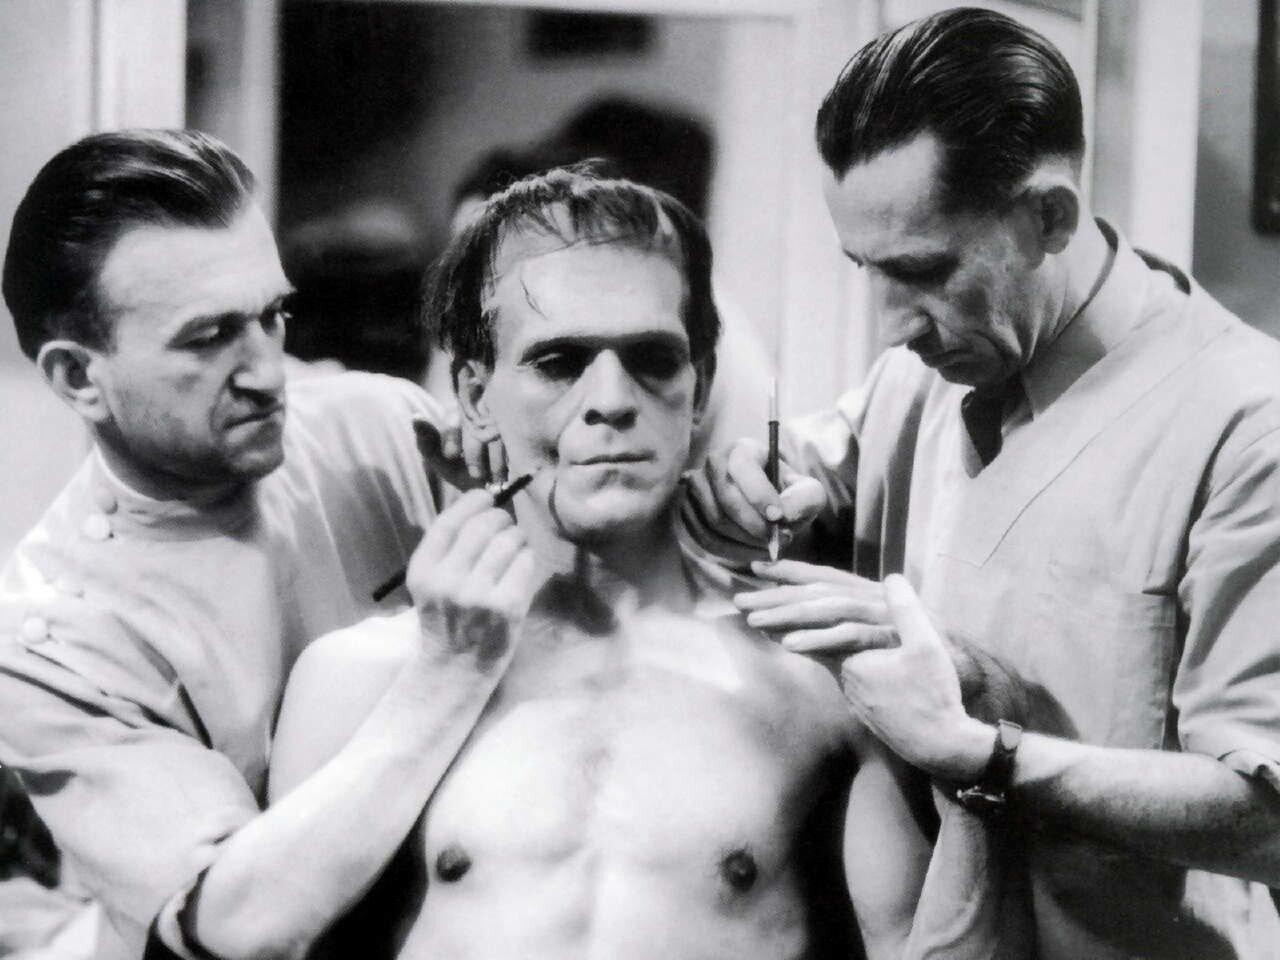 1931. Бориса Карлоффа гримируют для съемок «Франкенштейна»